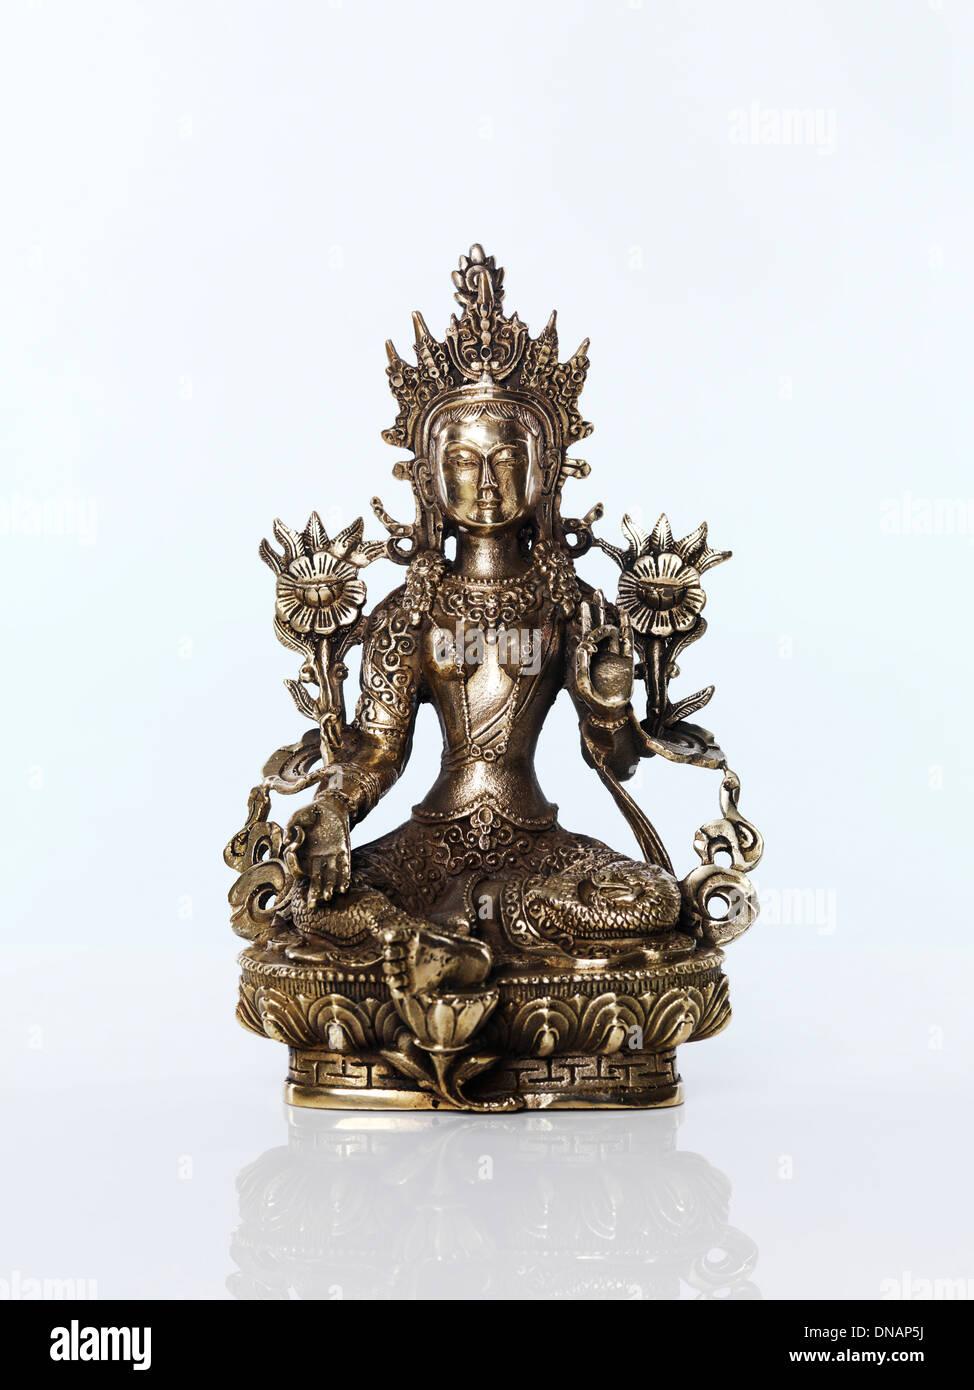 Green Tara statue Buddhist goddess of compassion. Isolated on white background. - Stock Image